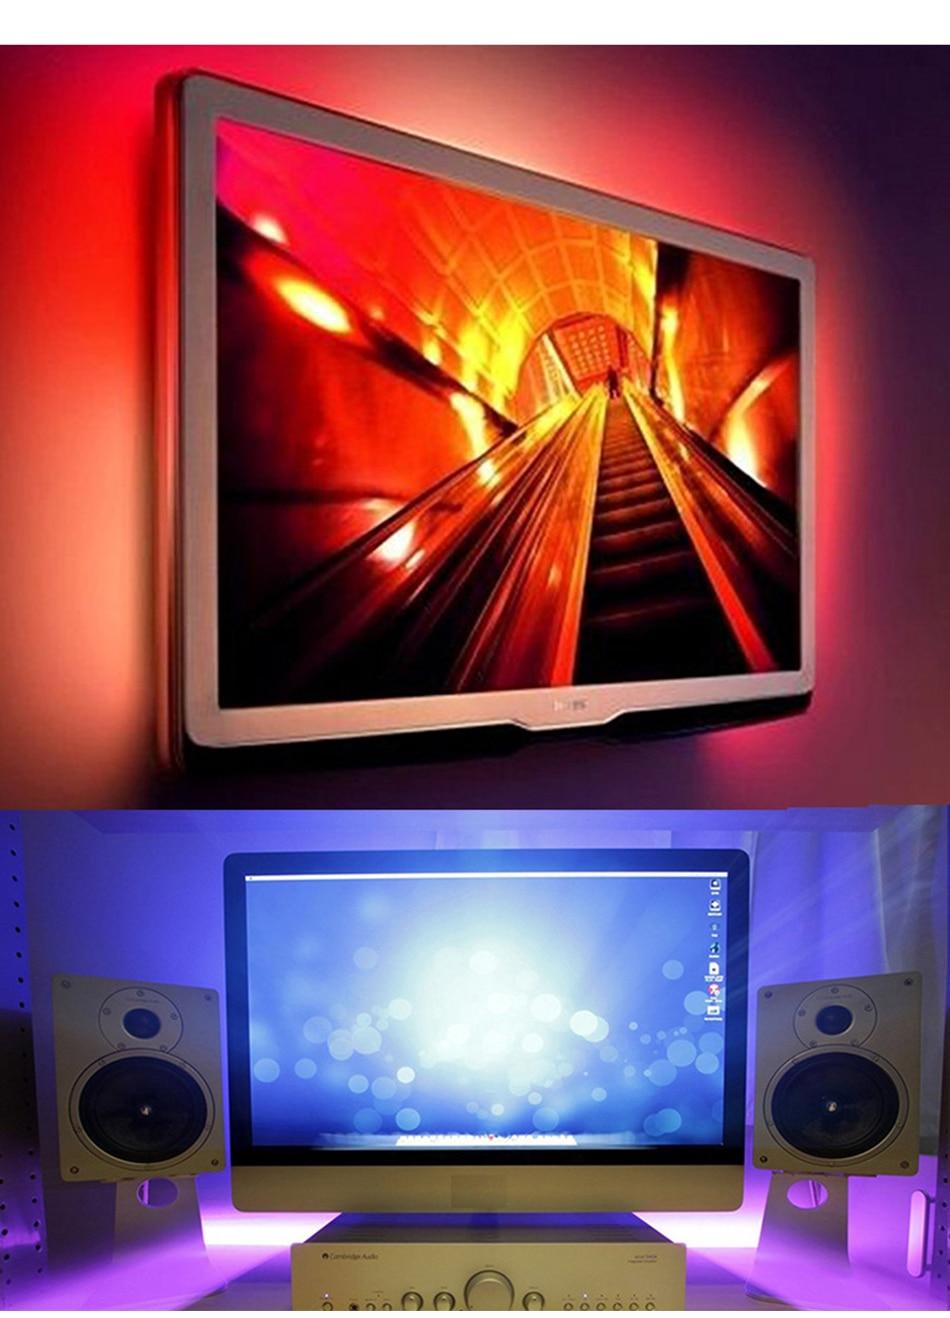 HTB10MuSacfrK1Rjy1Xdq6yemFXaD DC 5V LED Strip USB Cable Power Flexible Light Lamp 50CM 1M 2M 3M 4M 5M SMD 2835 Mini 3Key Desk Decor TV Background Lighting